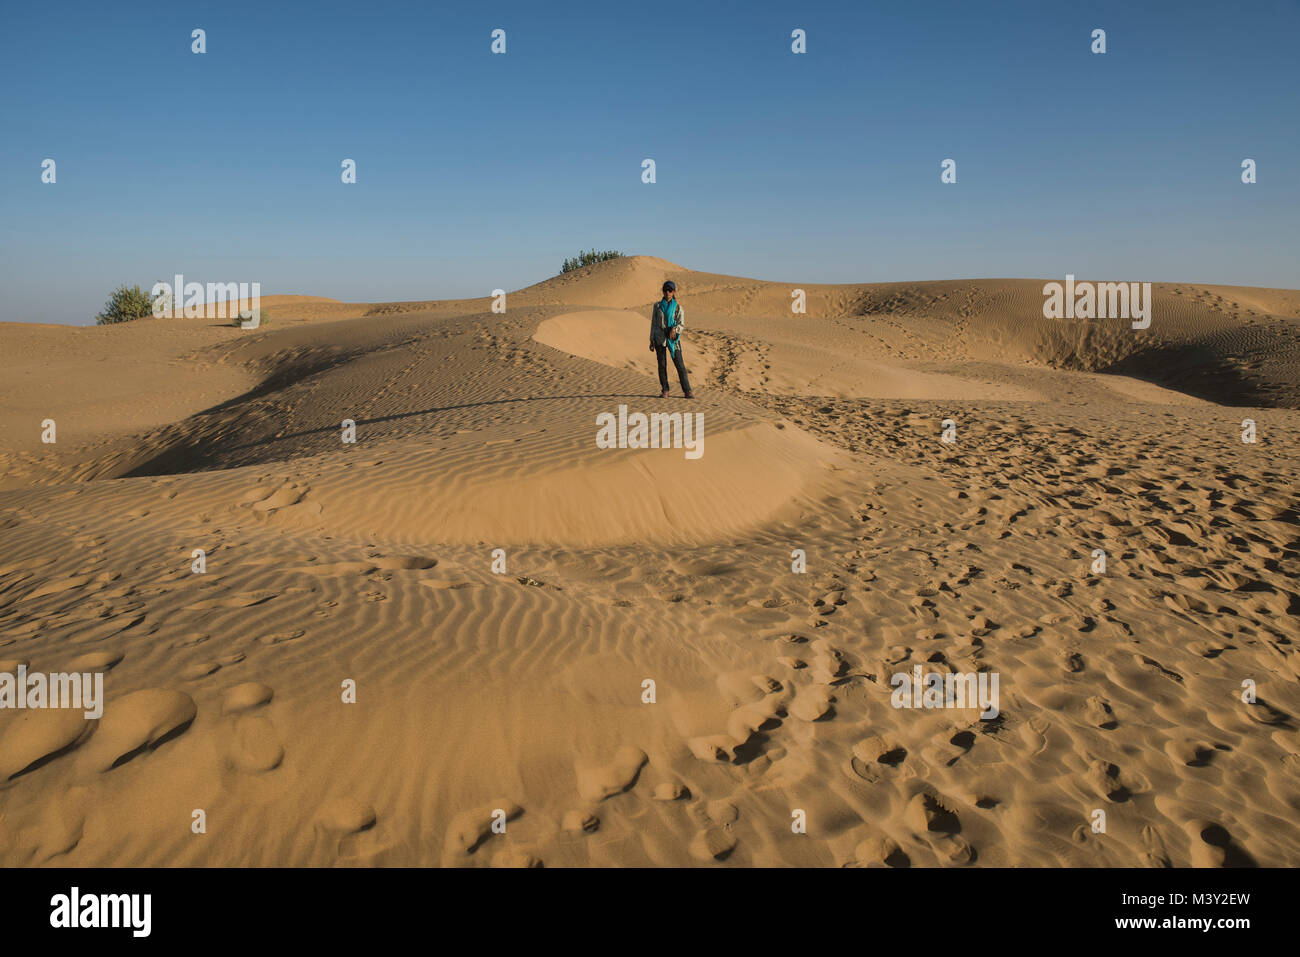 Le dune di sabbia del deserto di Thar, Rajasthan, India Immagini Stock